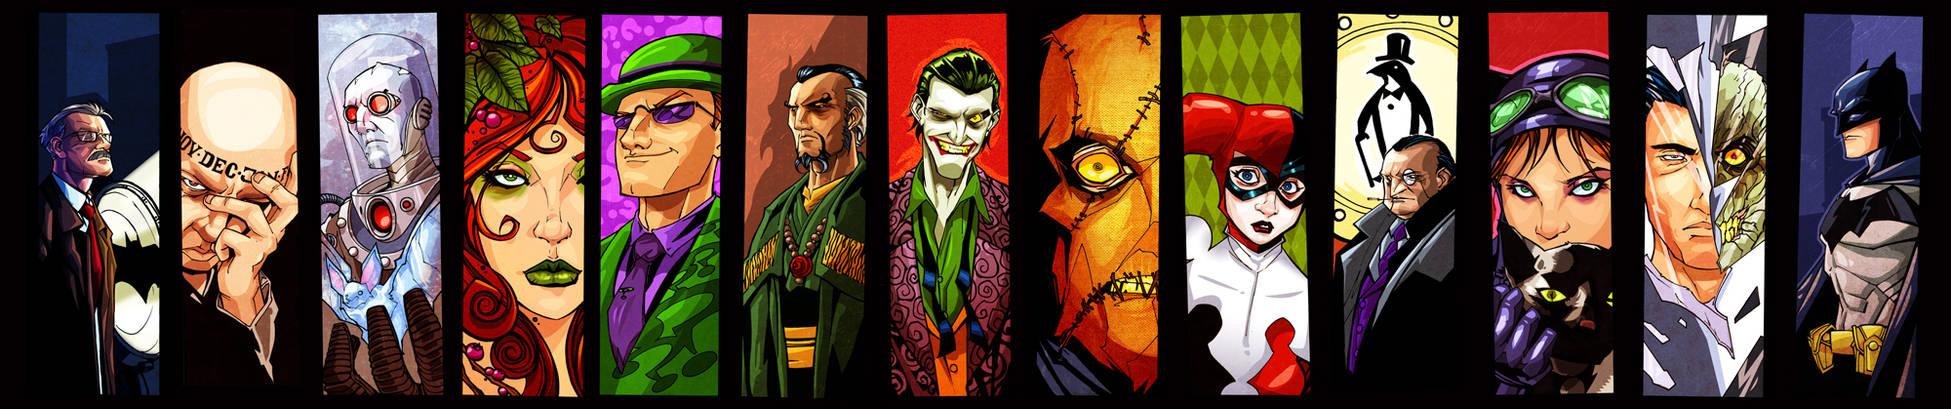 Gotham Icons: Complete set.